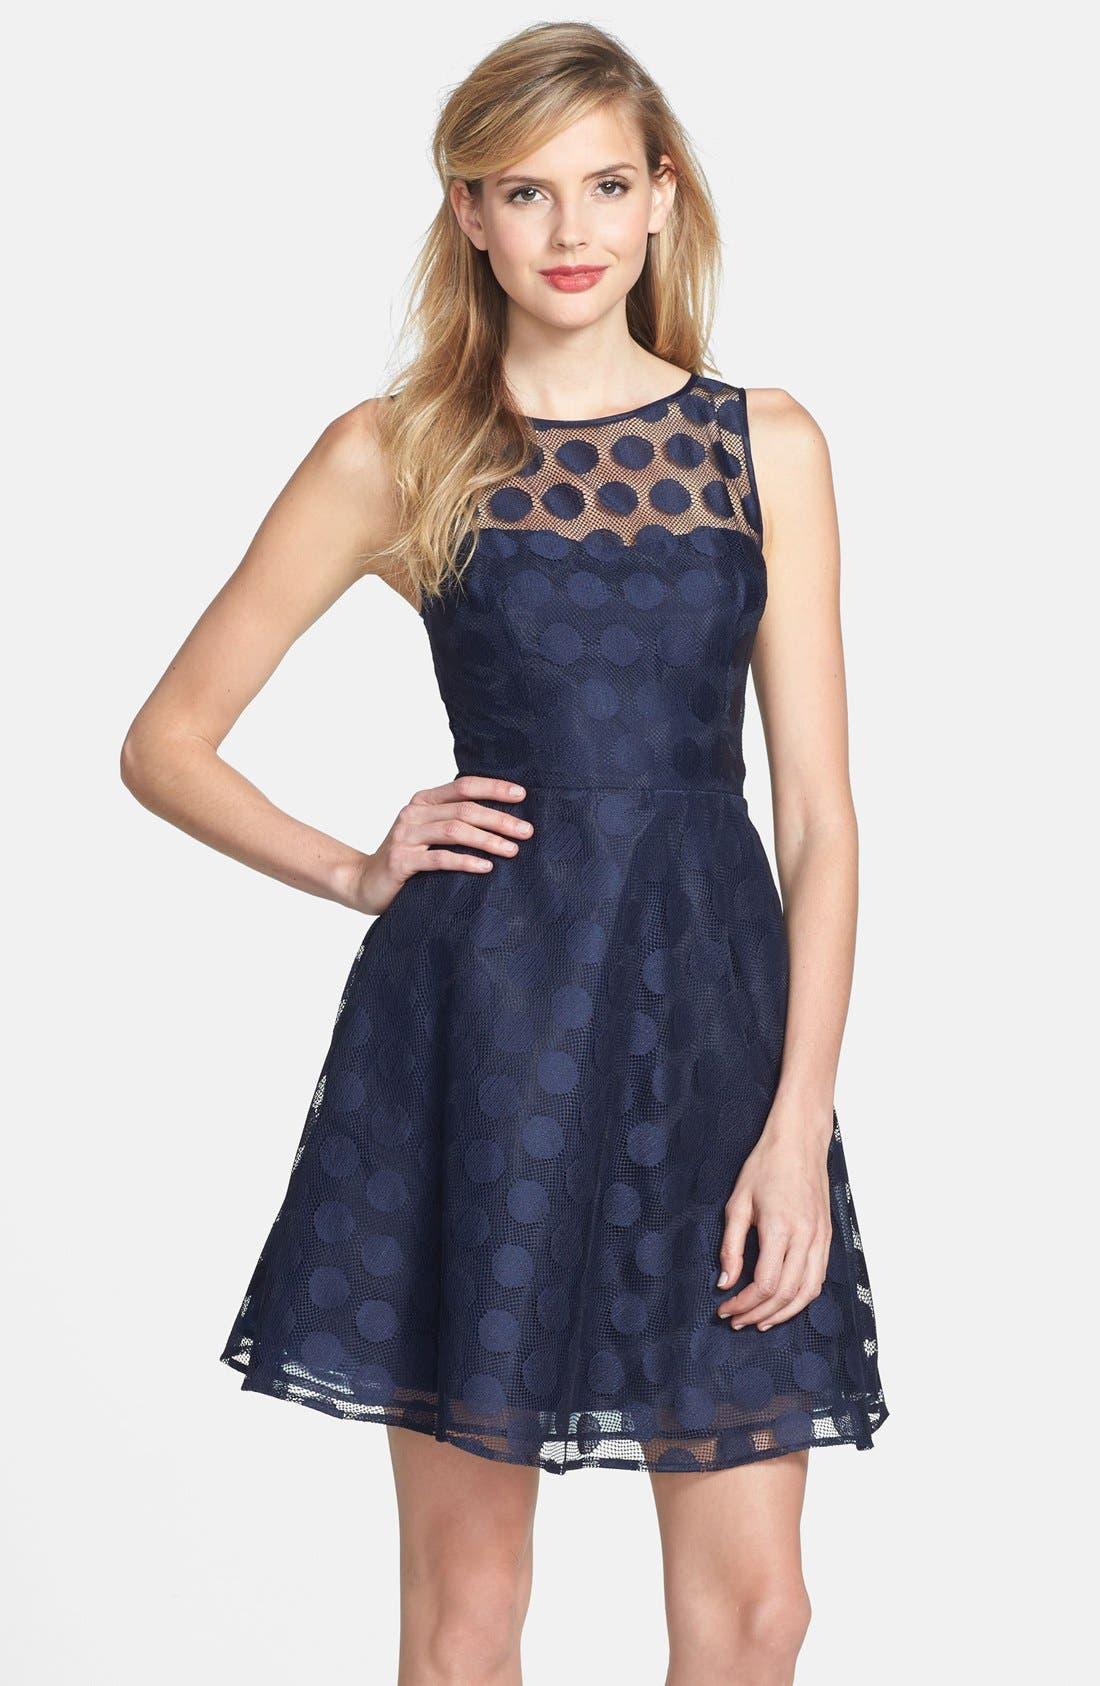 Alternate Image 1 Selected - Betsey Johnson 'Ivory' Polka Dot Mesh Fit & Flare Dress